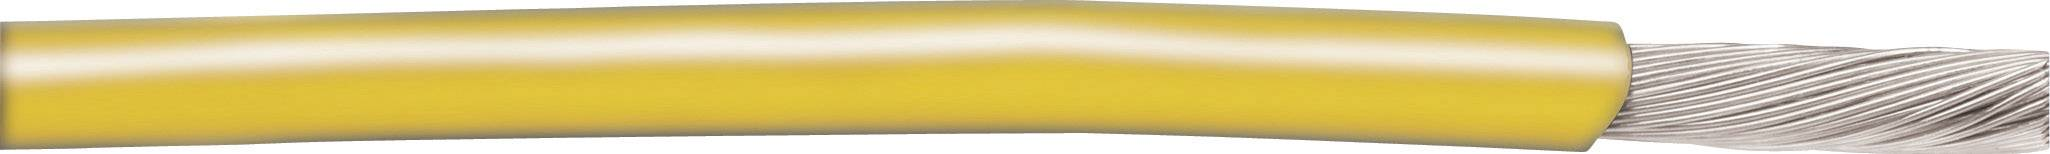 Pletenica 1 x 0.08 mm, bela AlphaWire 6820 30.5 m